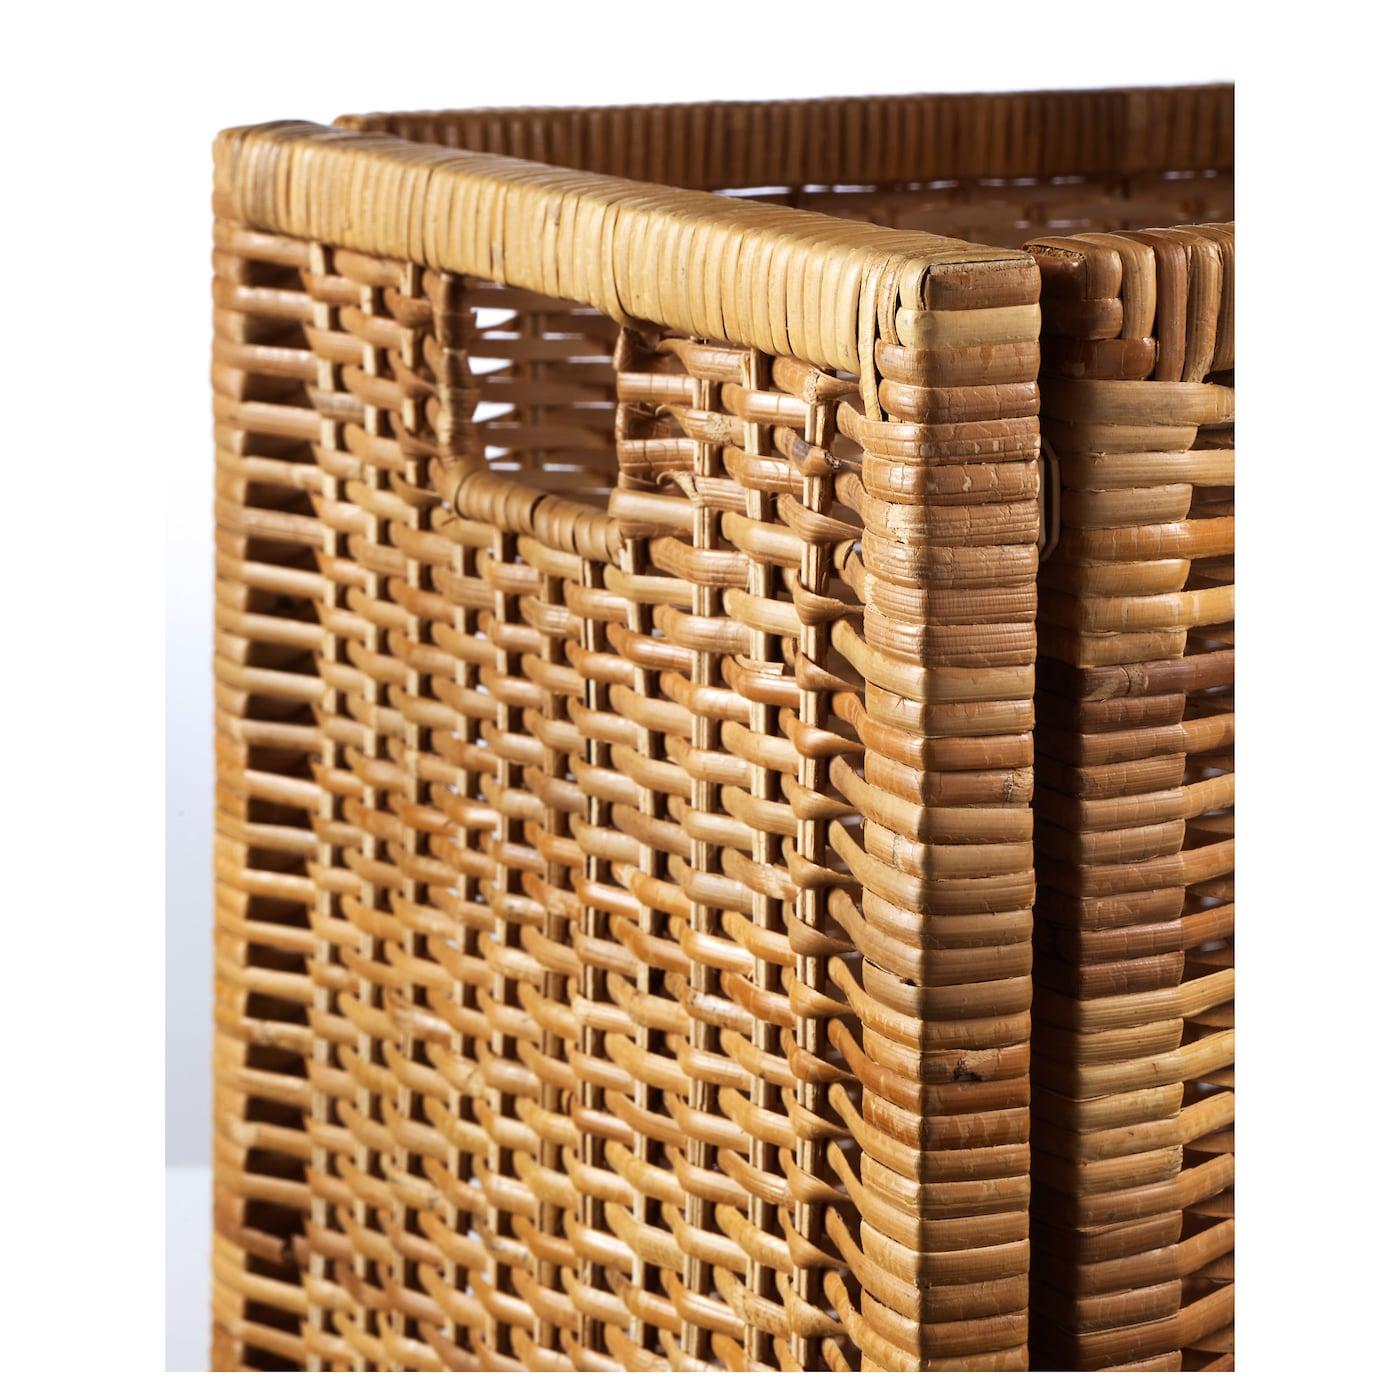 bran s panier rotin 32x34x32 cm ikea. Black Bedroom Furniture Sets. Home Design Ideas